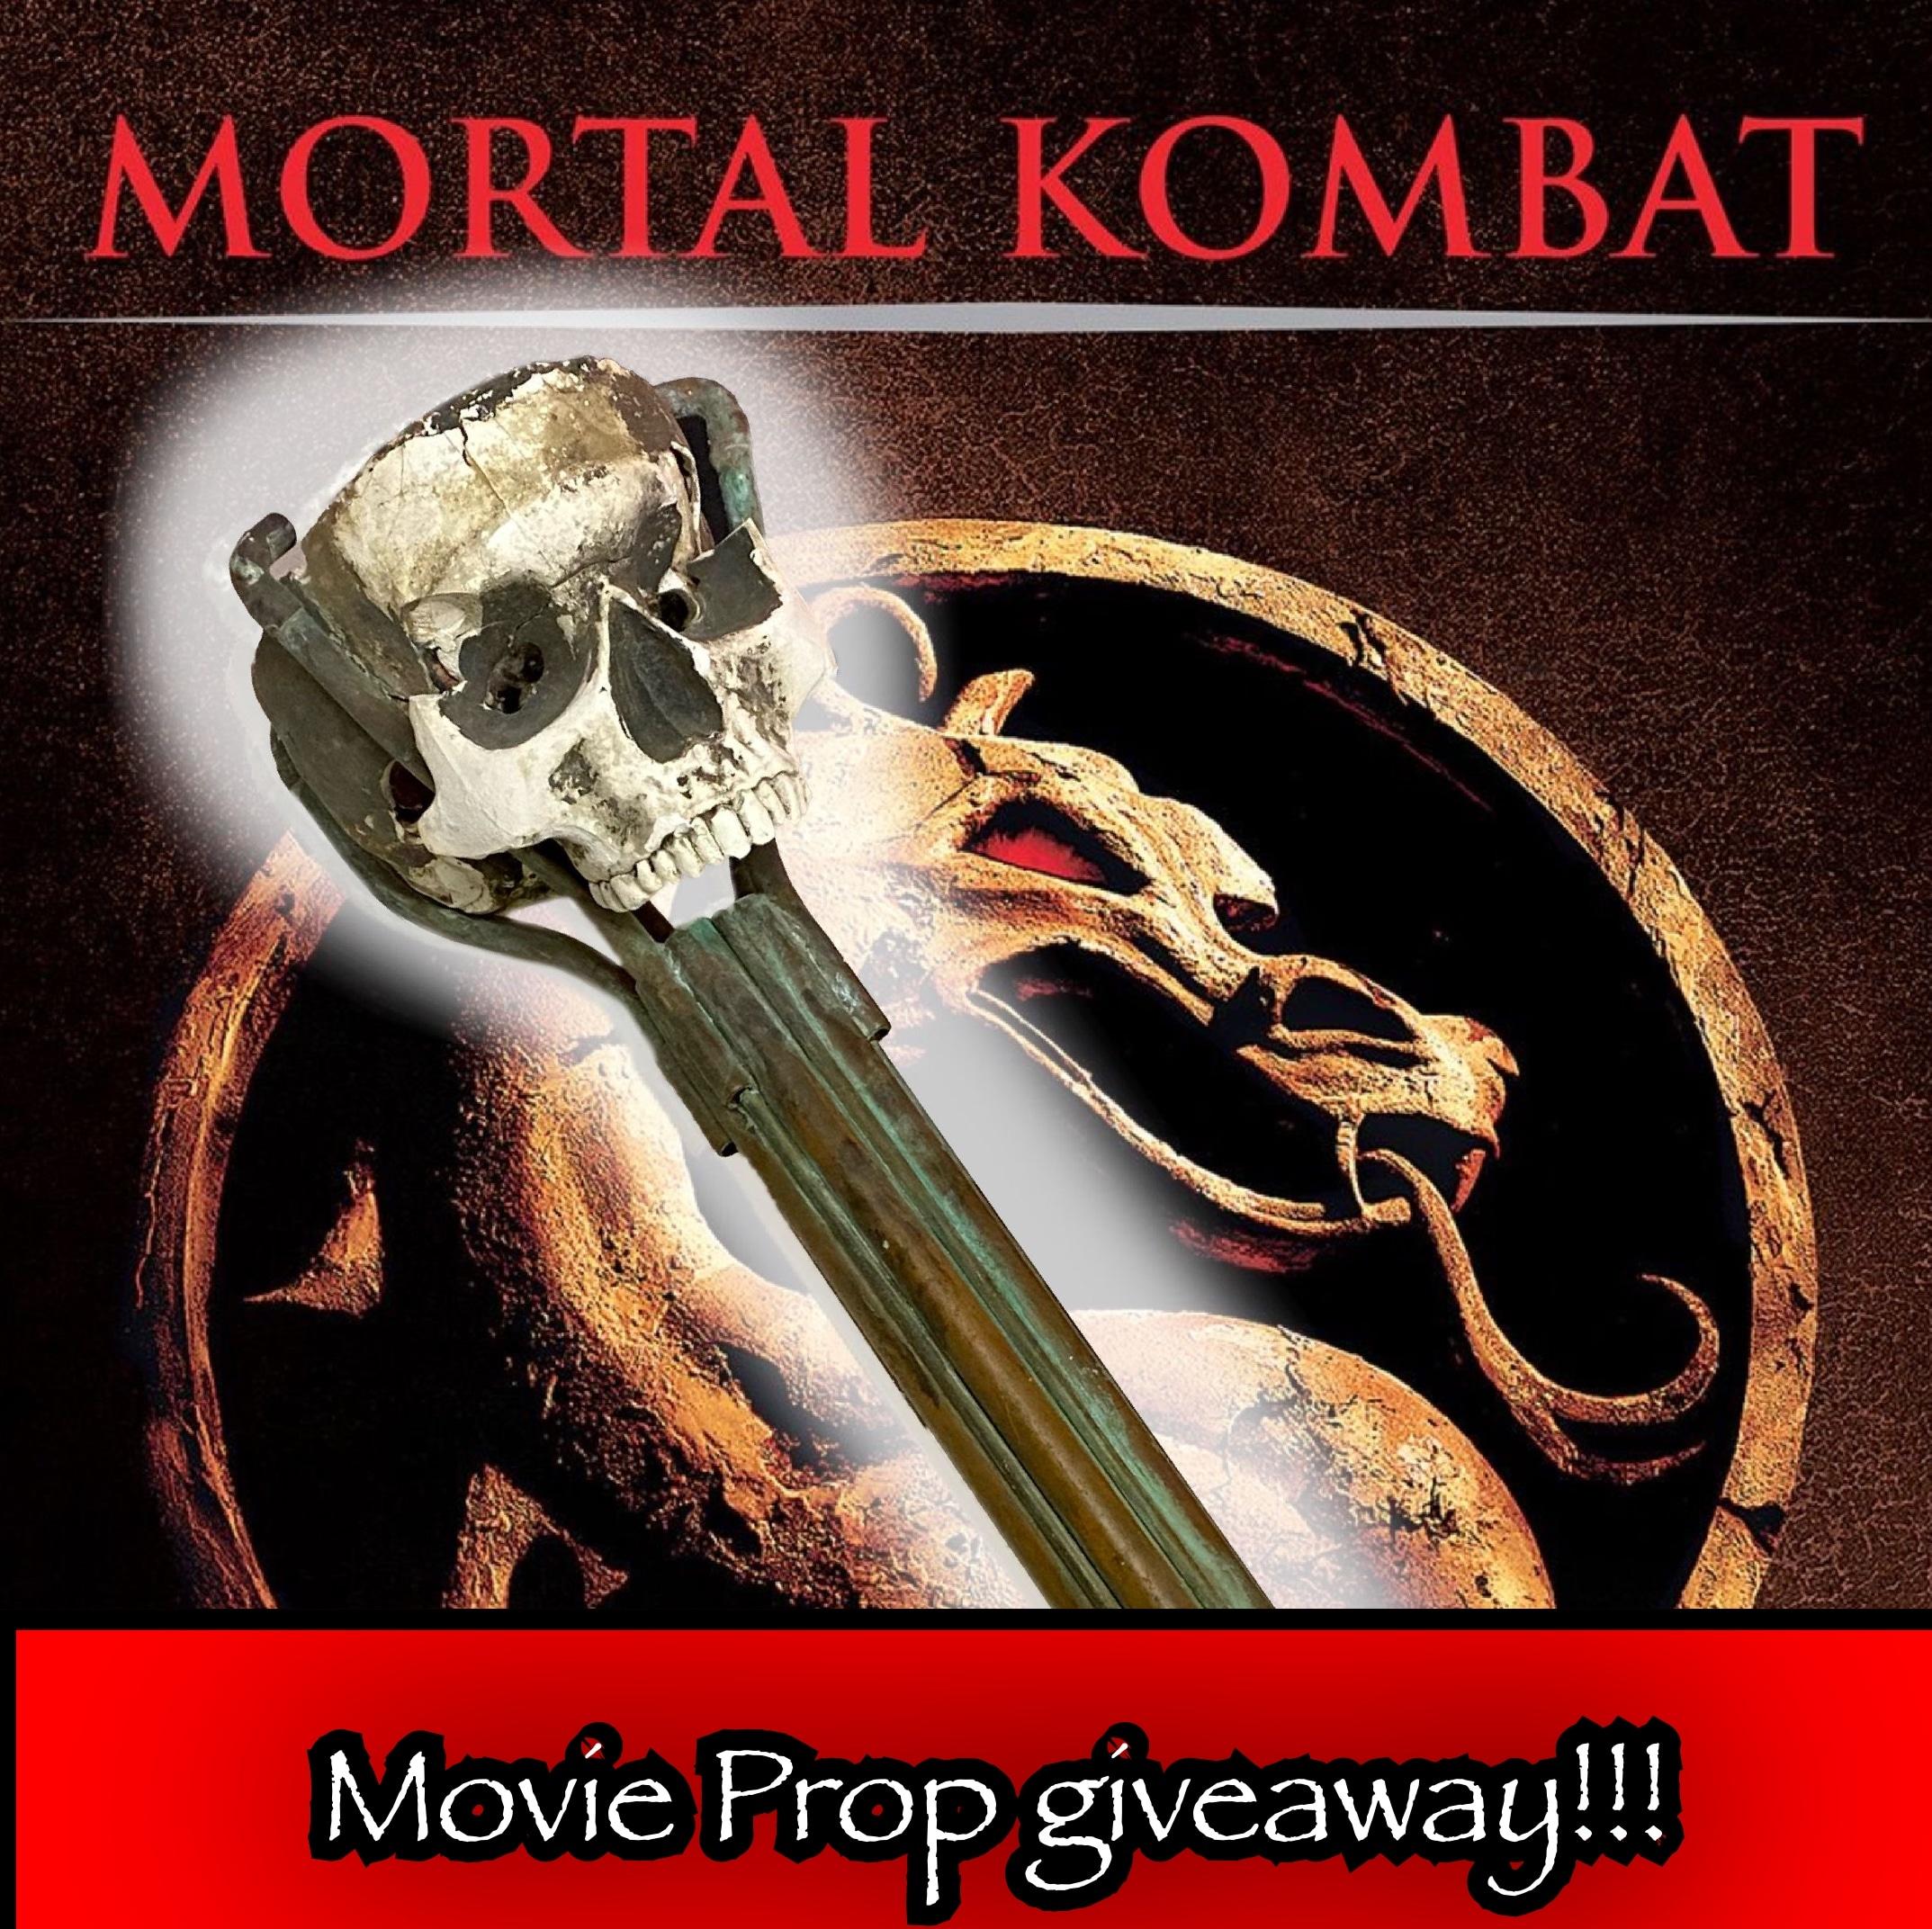 Movie Relics Mortal Kombat Prop Giveaway Giveaway Image